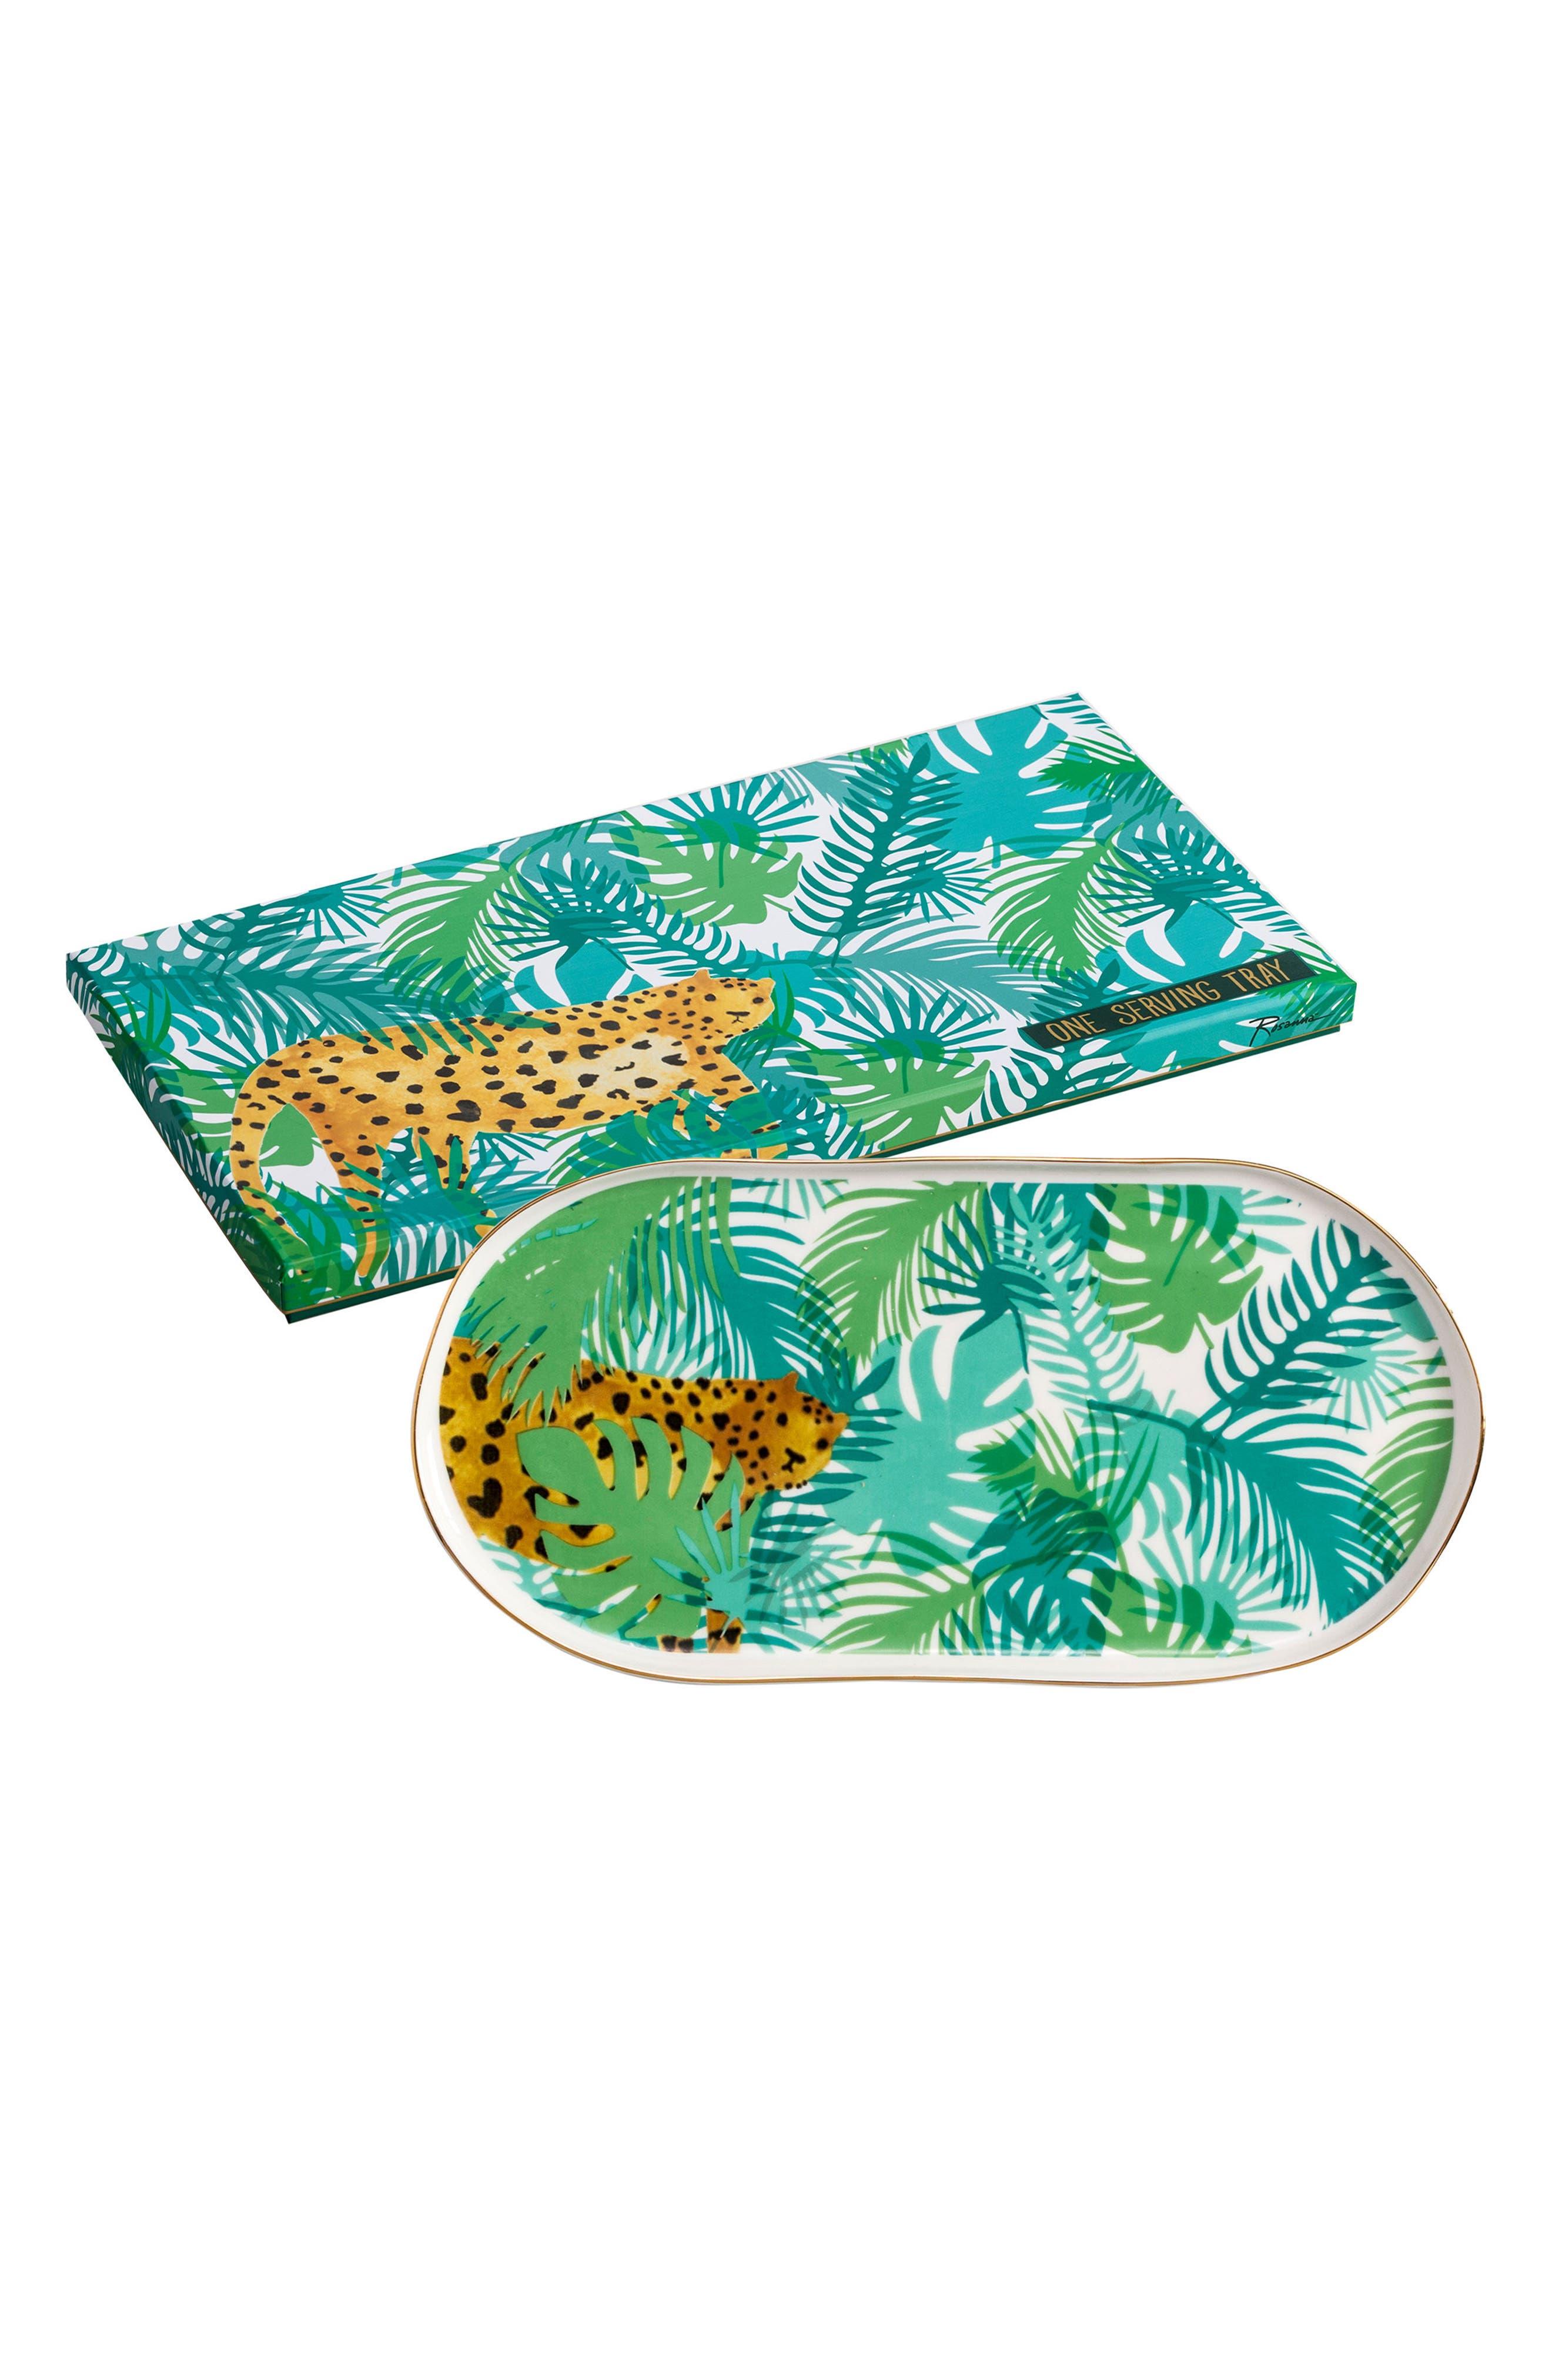 Be Wild Cheetah Tray,                         Main,                         color, Green Multi